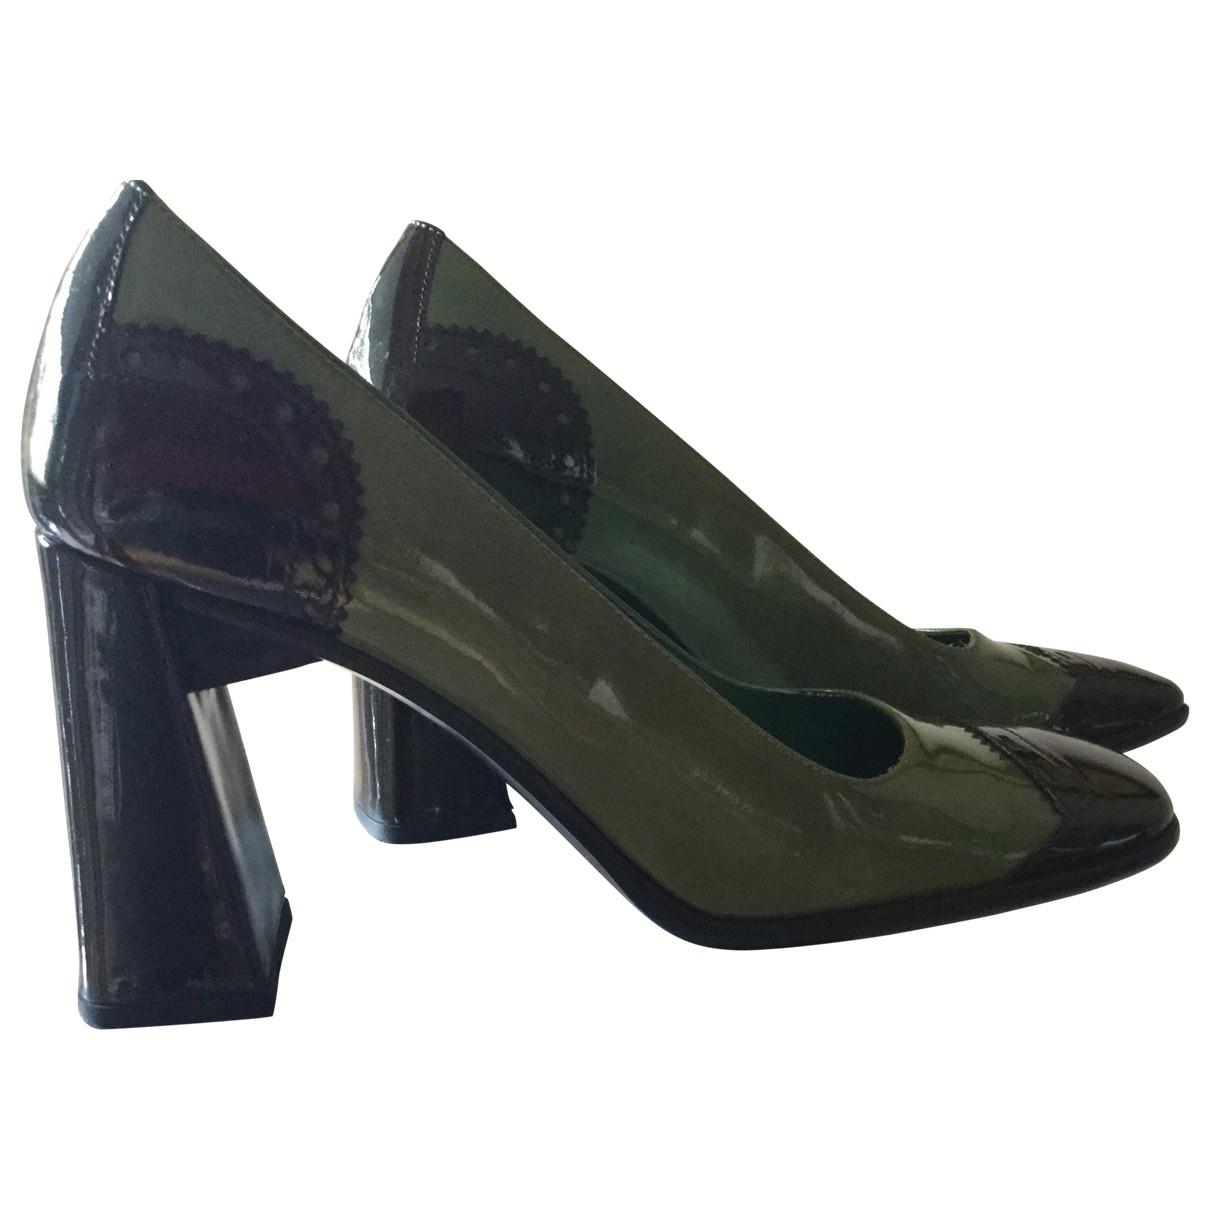 Prada - Escarpins   pour femme en cuir verni - vert